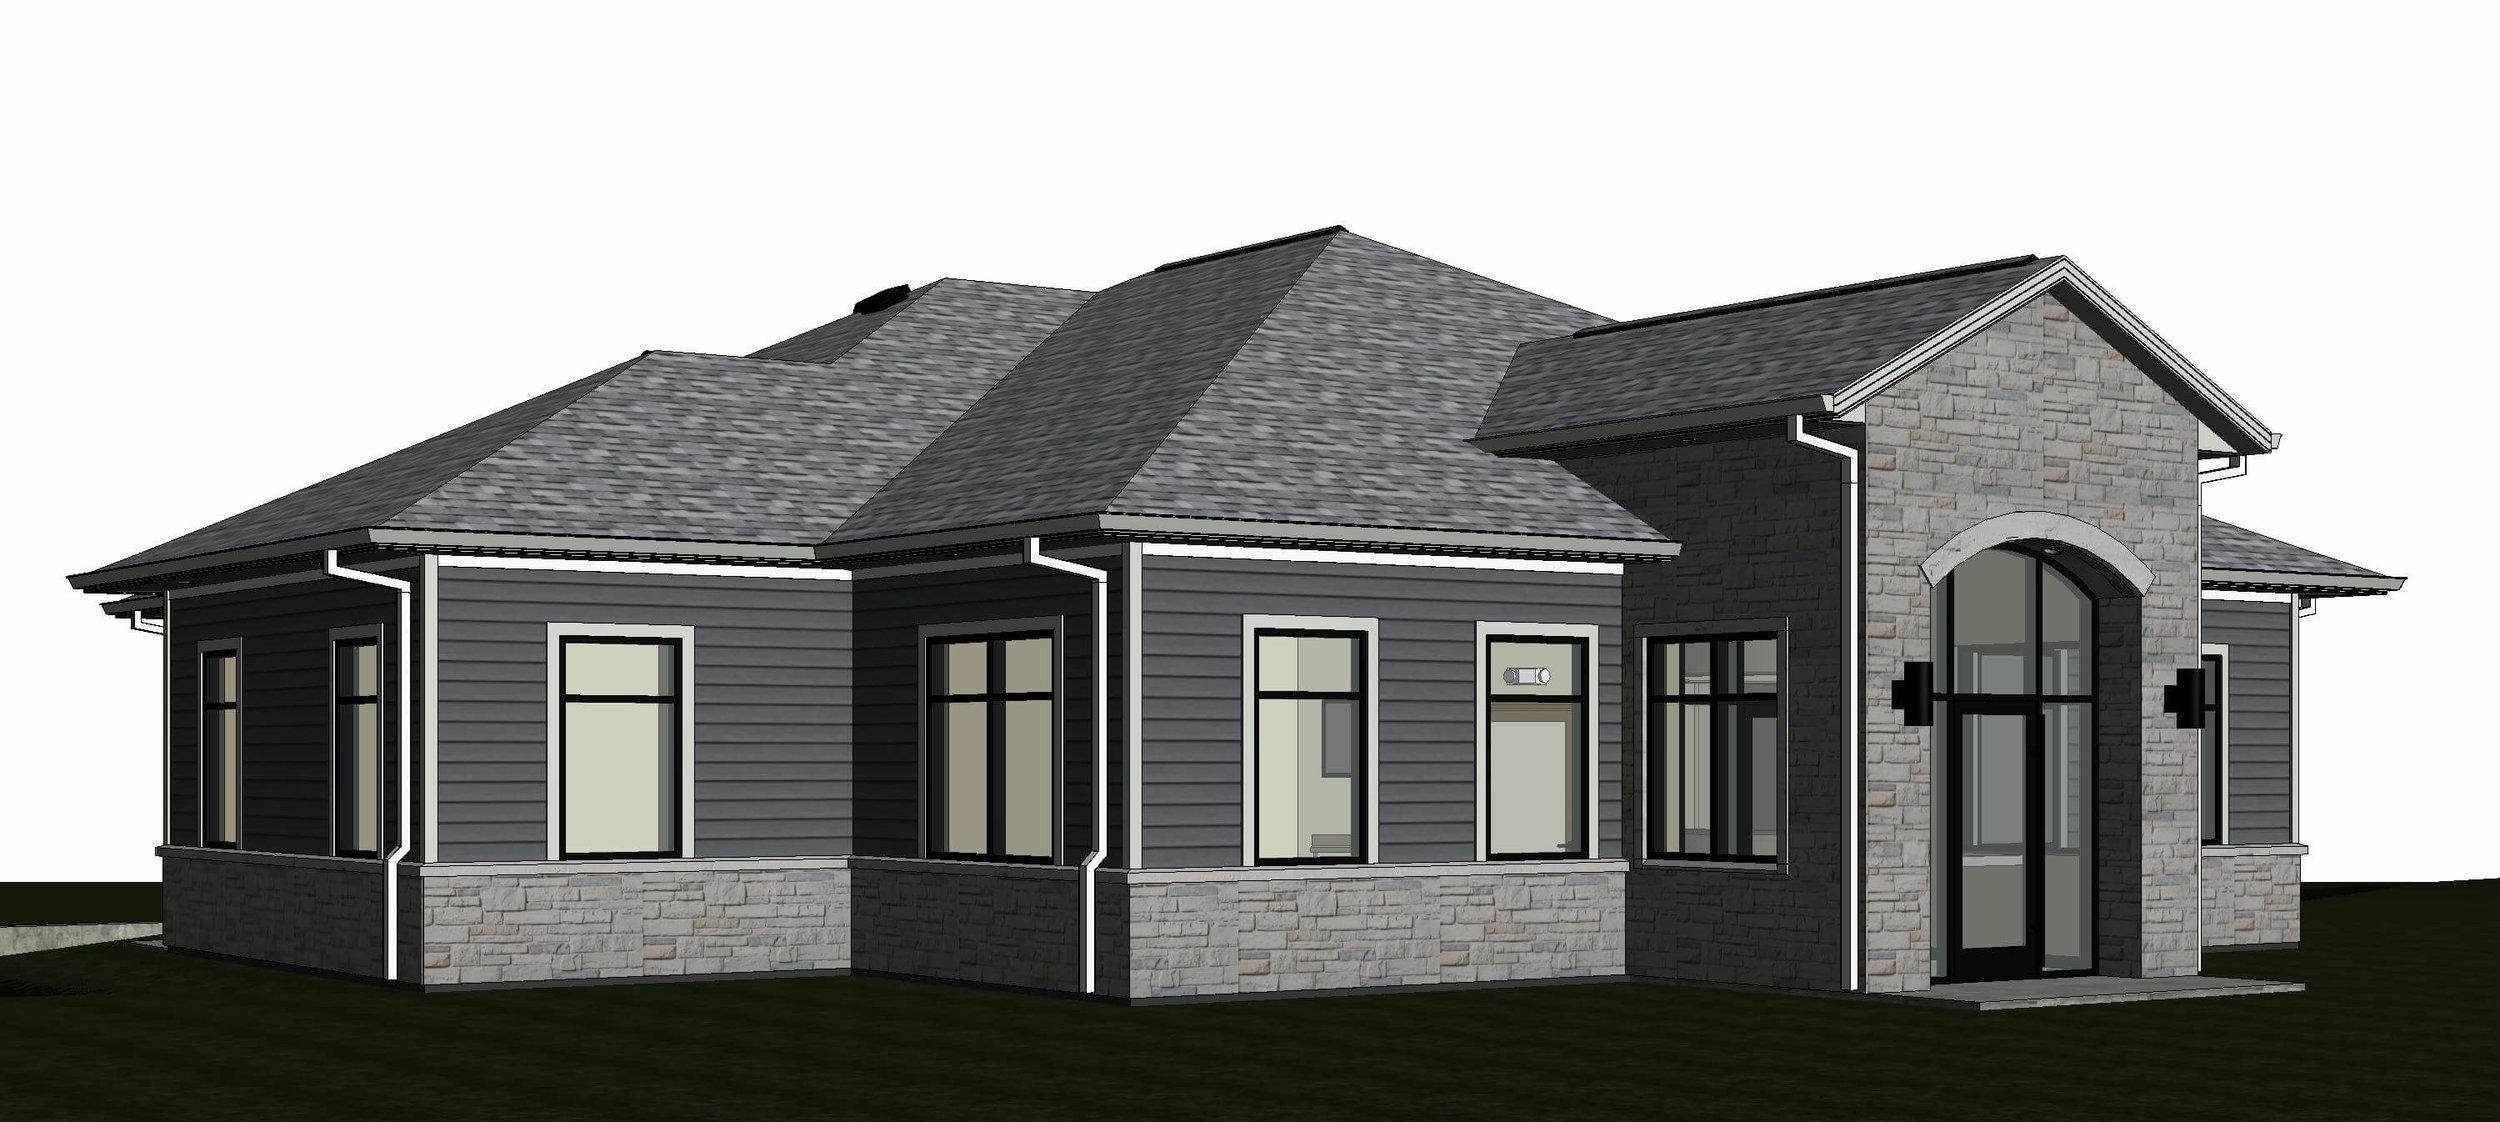 Dyersville Family Dental - Construction Rendering.jpg